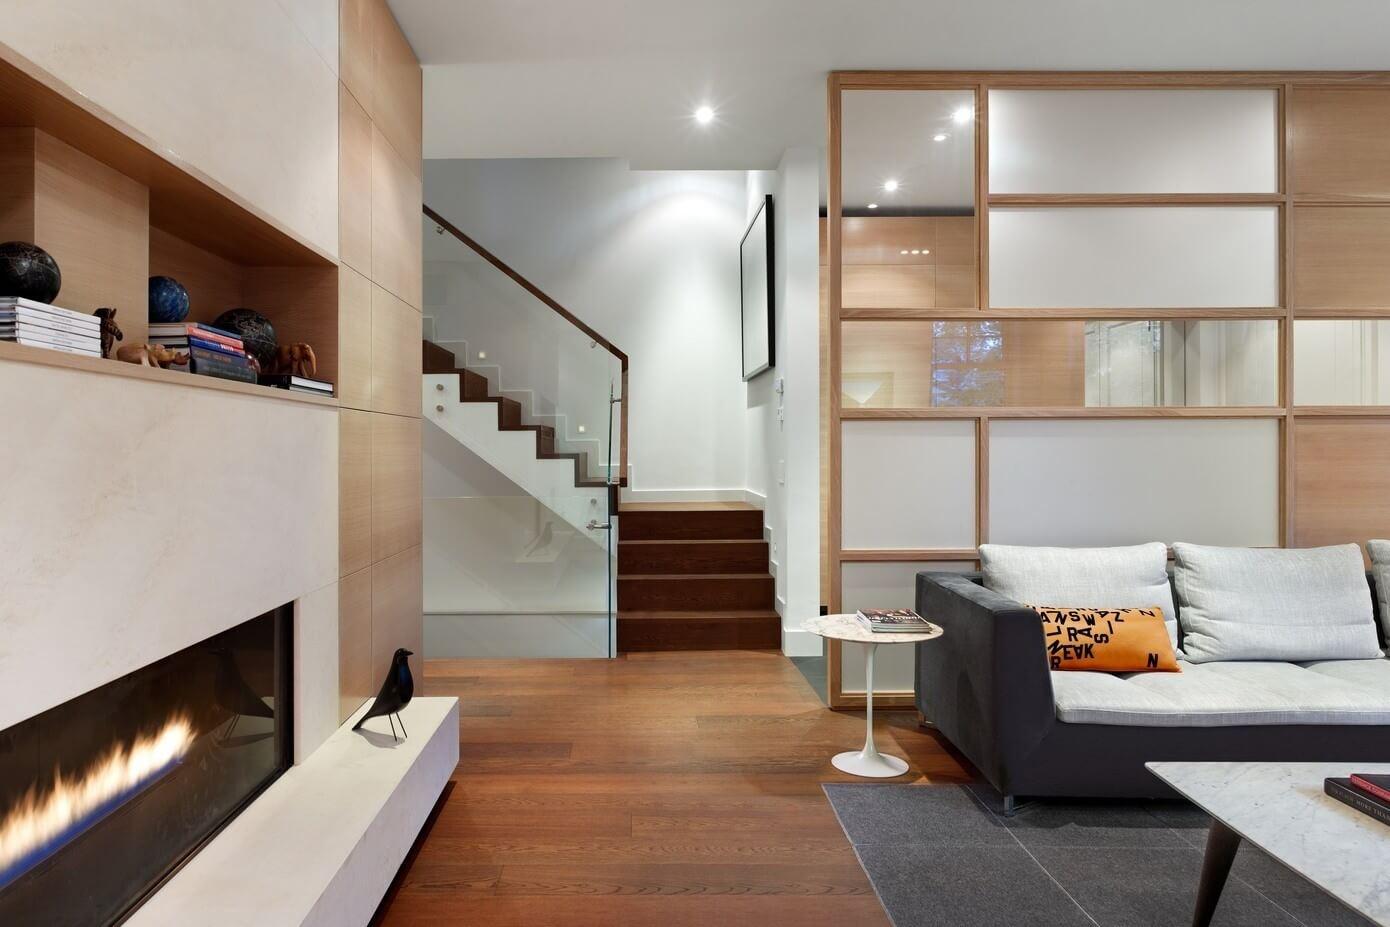 003 Annex House Dubbeldam Architecture Design Homeadore